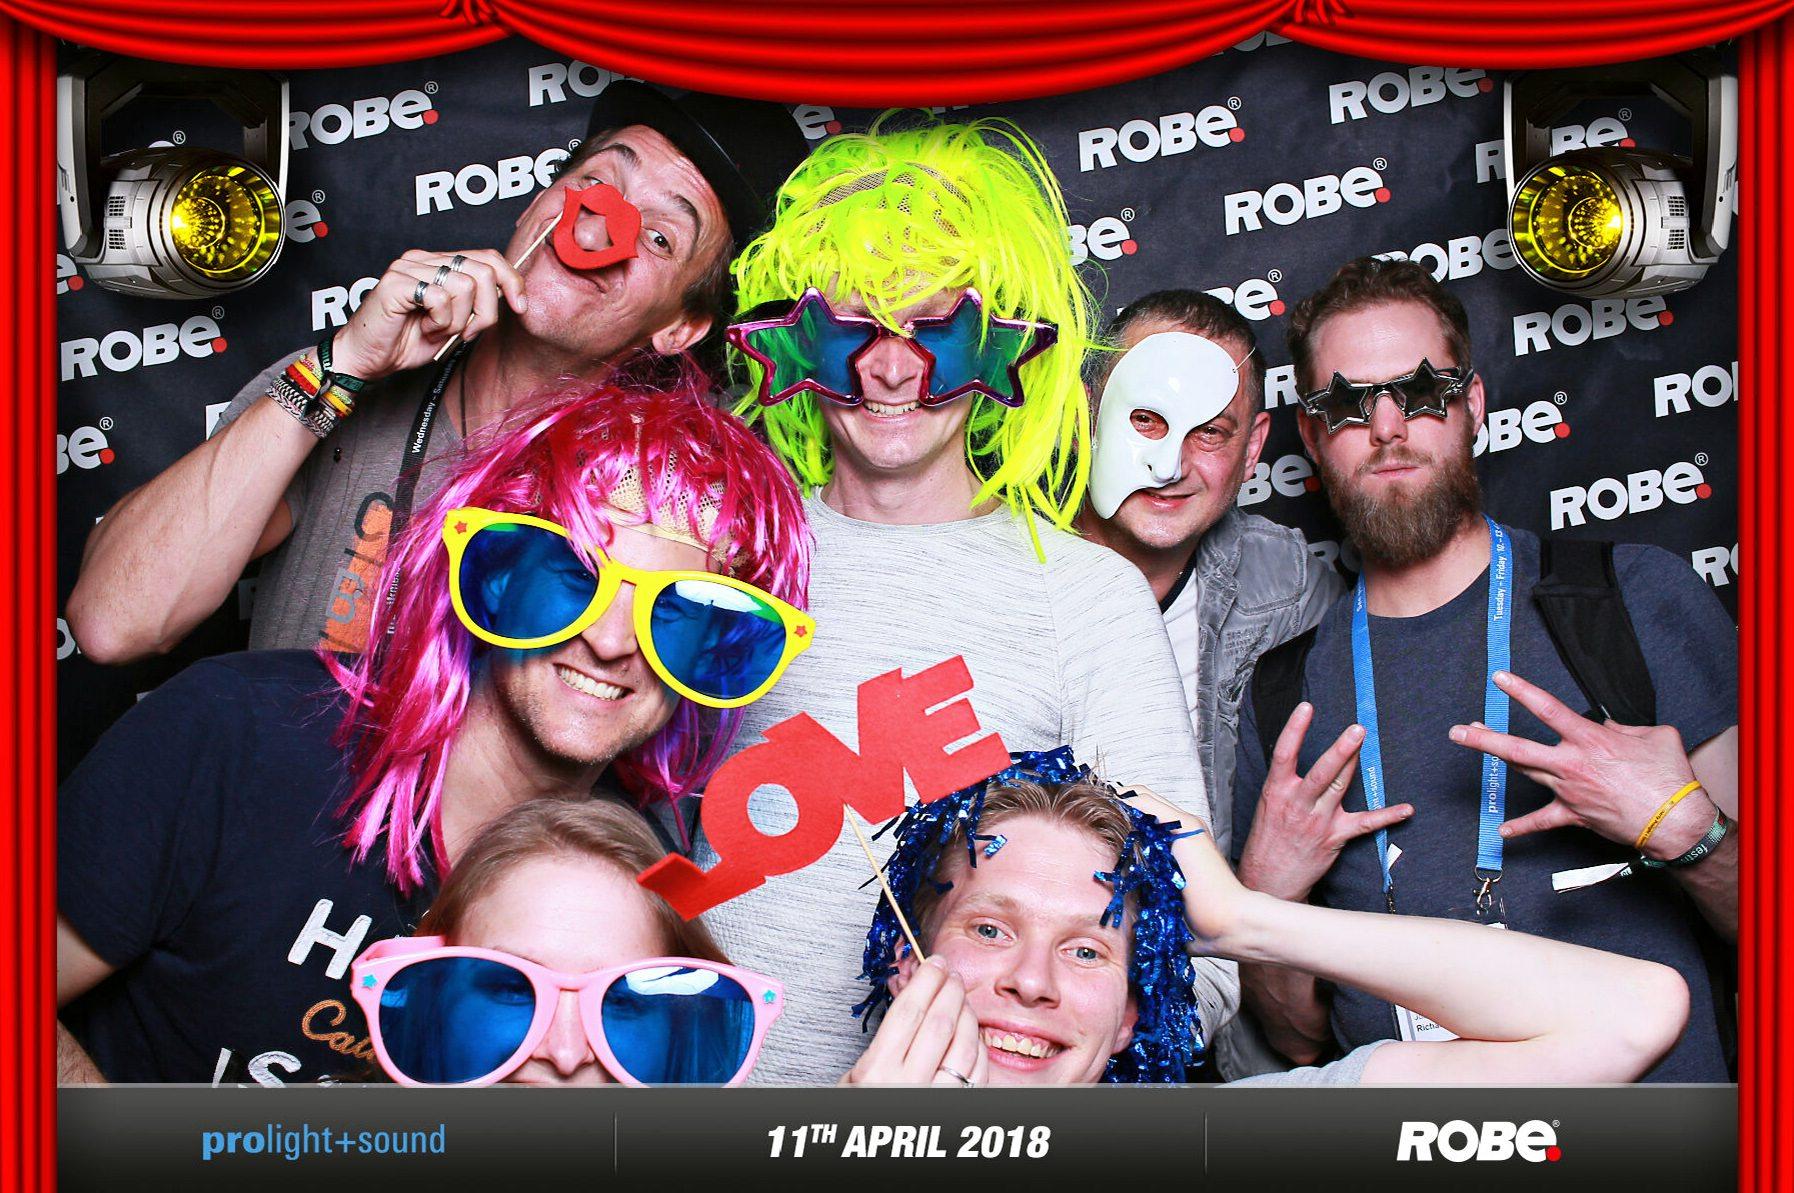 fotokoutek-robe-prolight-sound-11-4-2018-406453